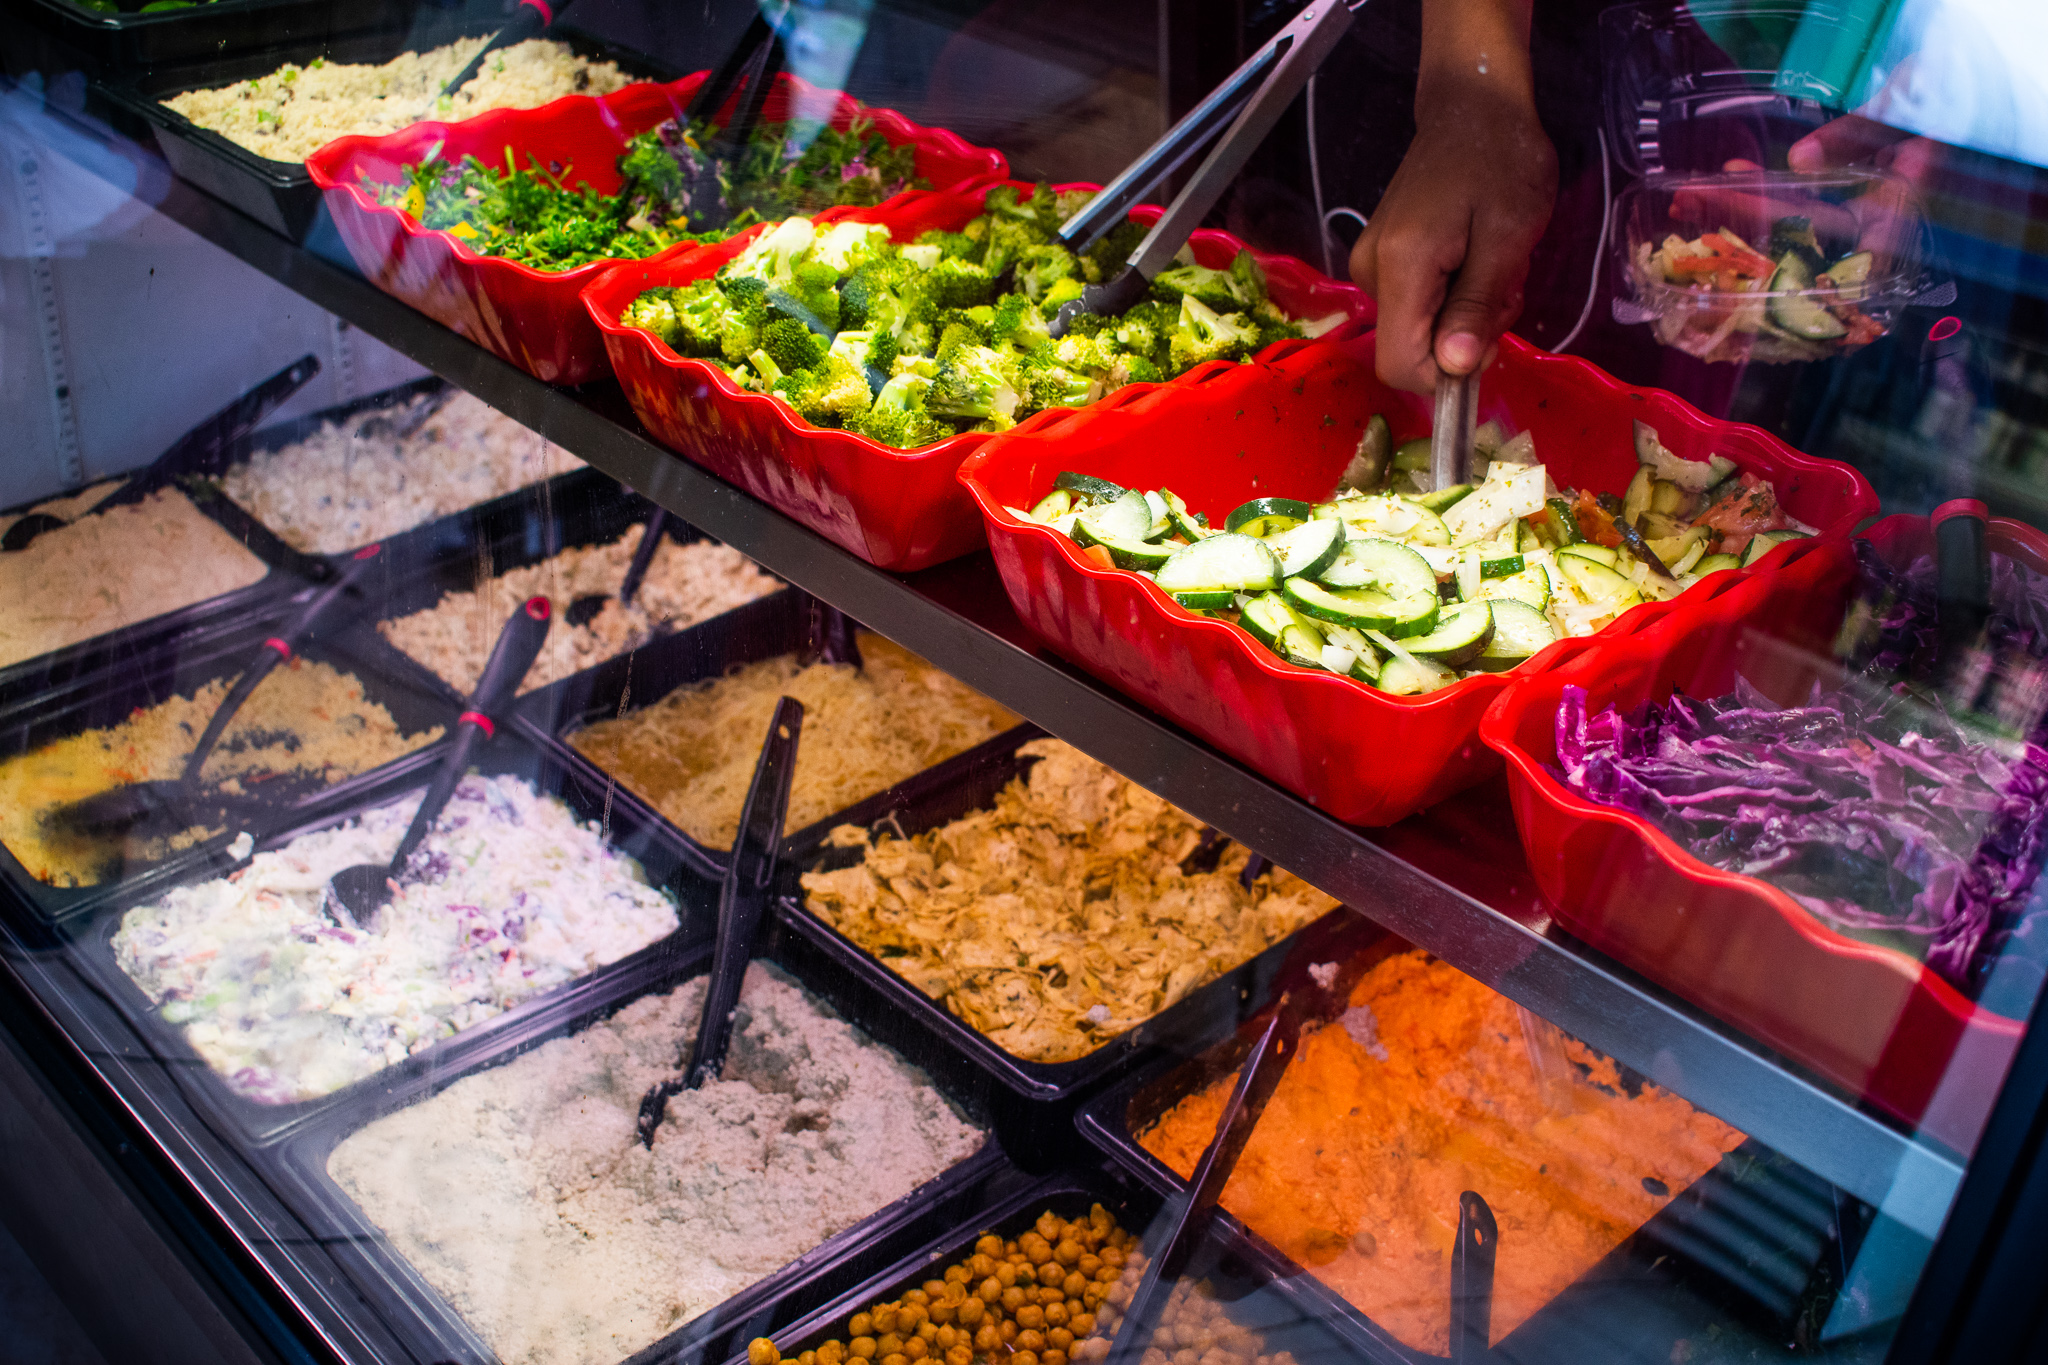 Uprooted-Traveler-Vegan-Food-Guide-Chicago-Origional-Soul-Vegetarian-deli-case.jpg